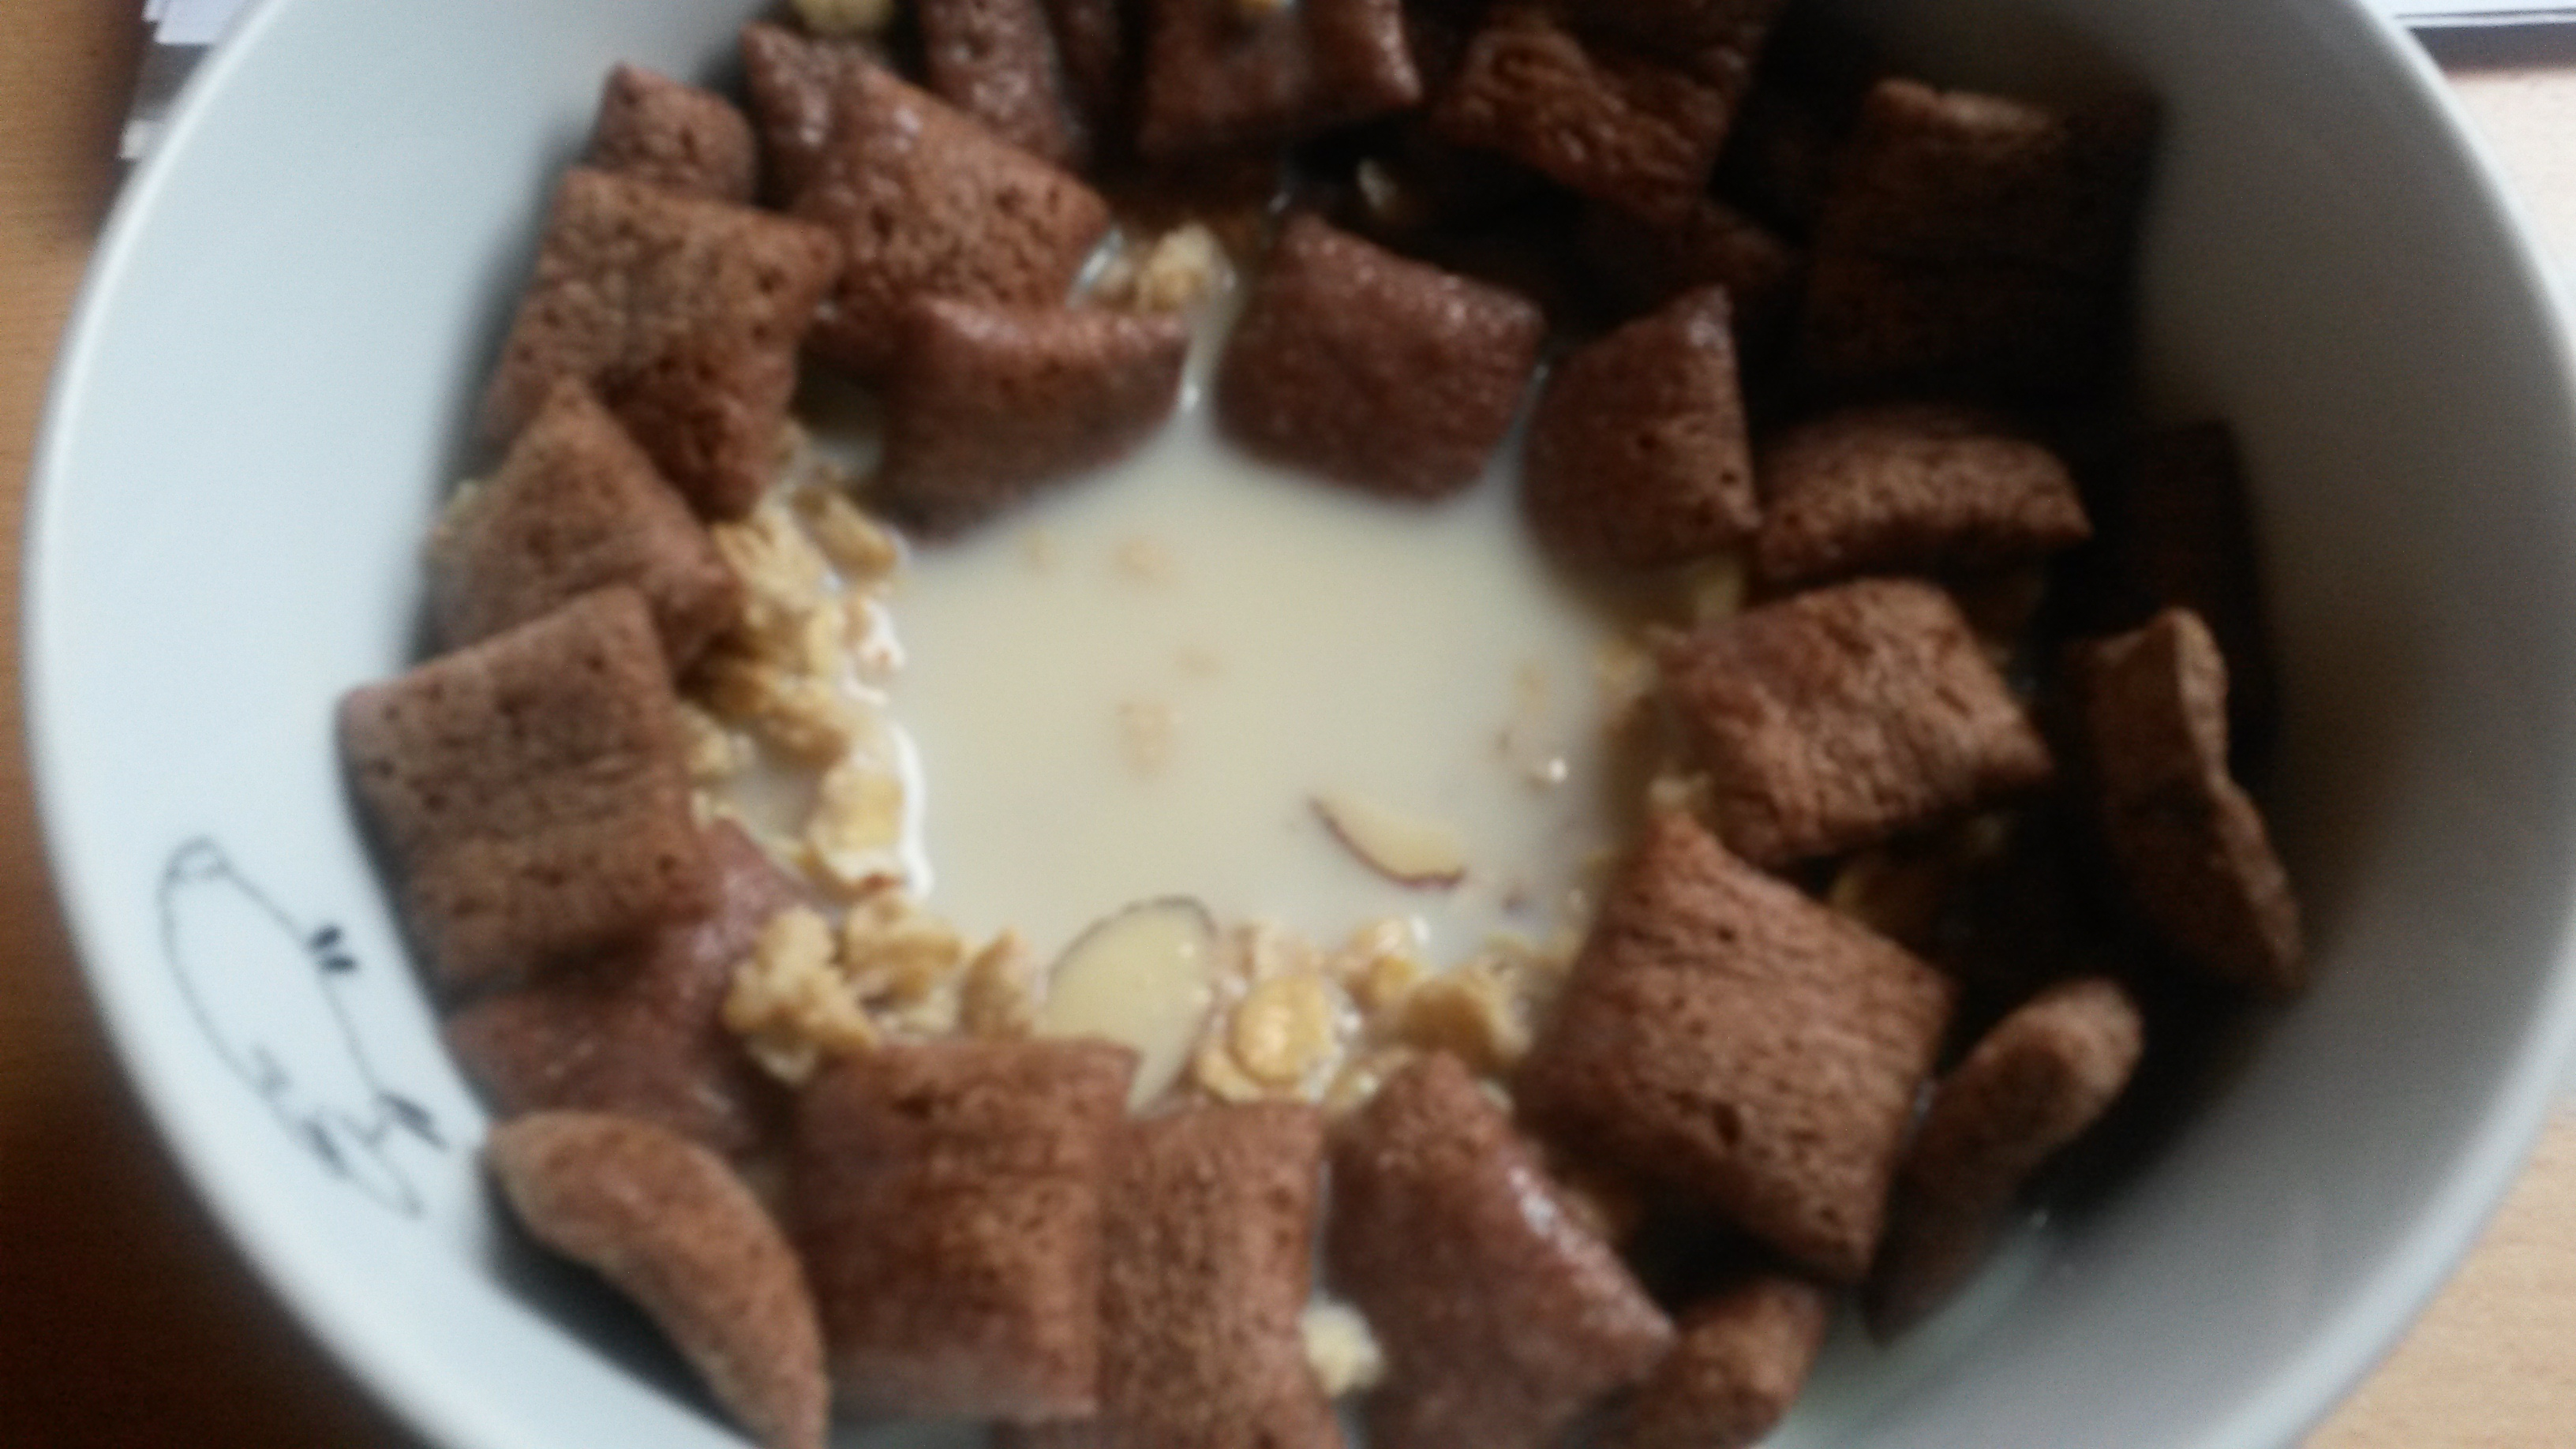 https://foodloader.net/sk0r_2013-10-05_Breakfast.jpg